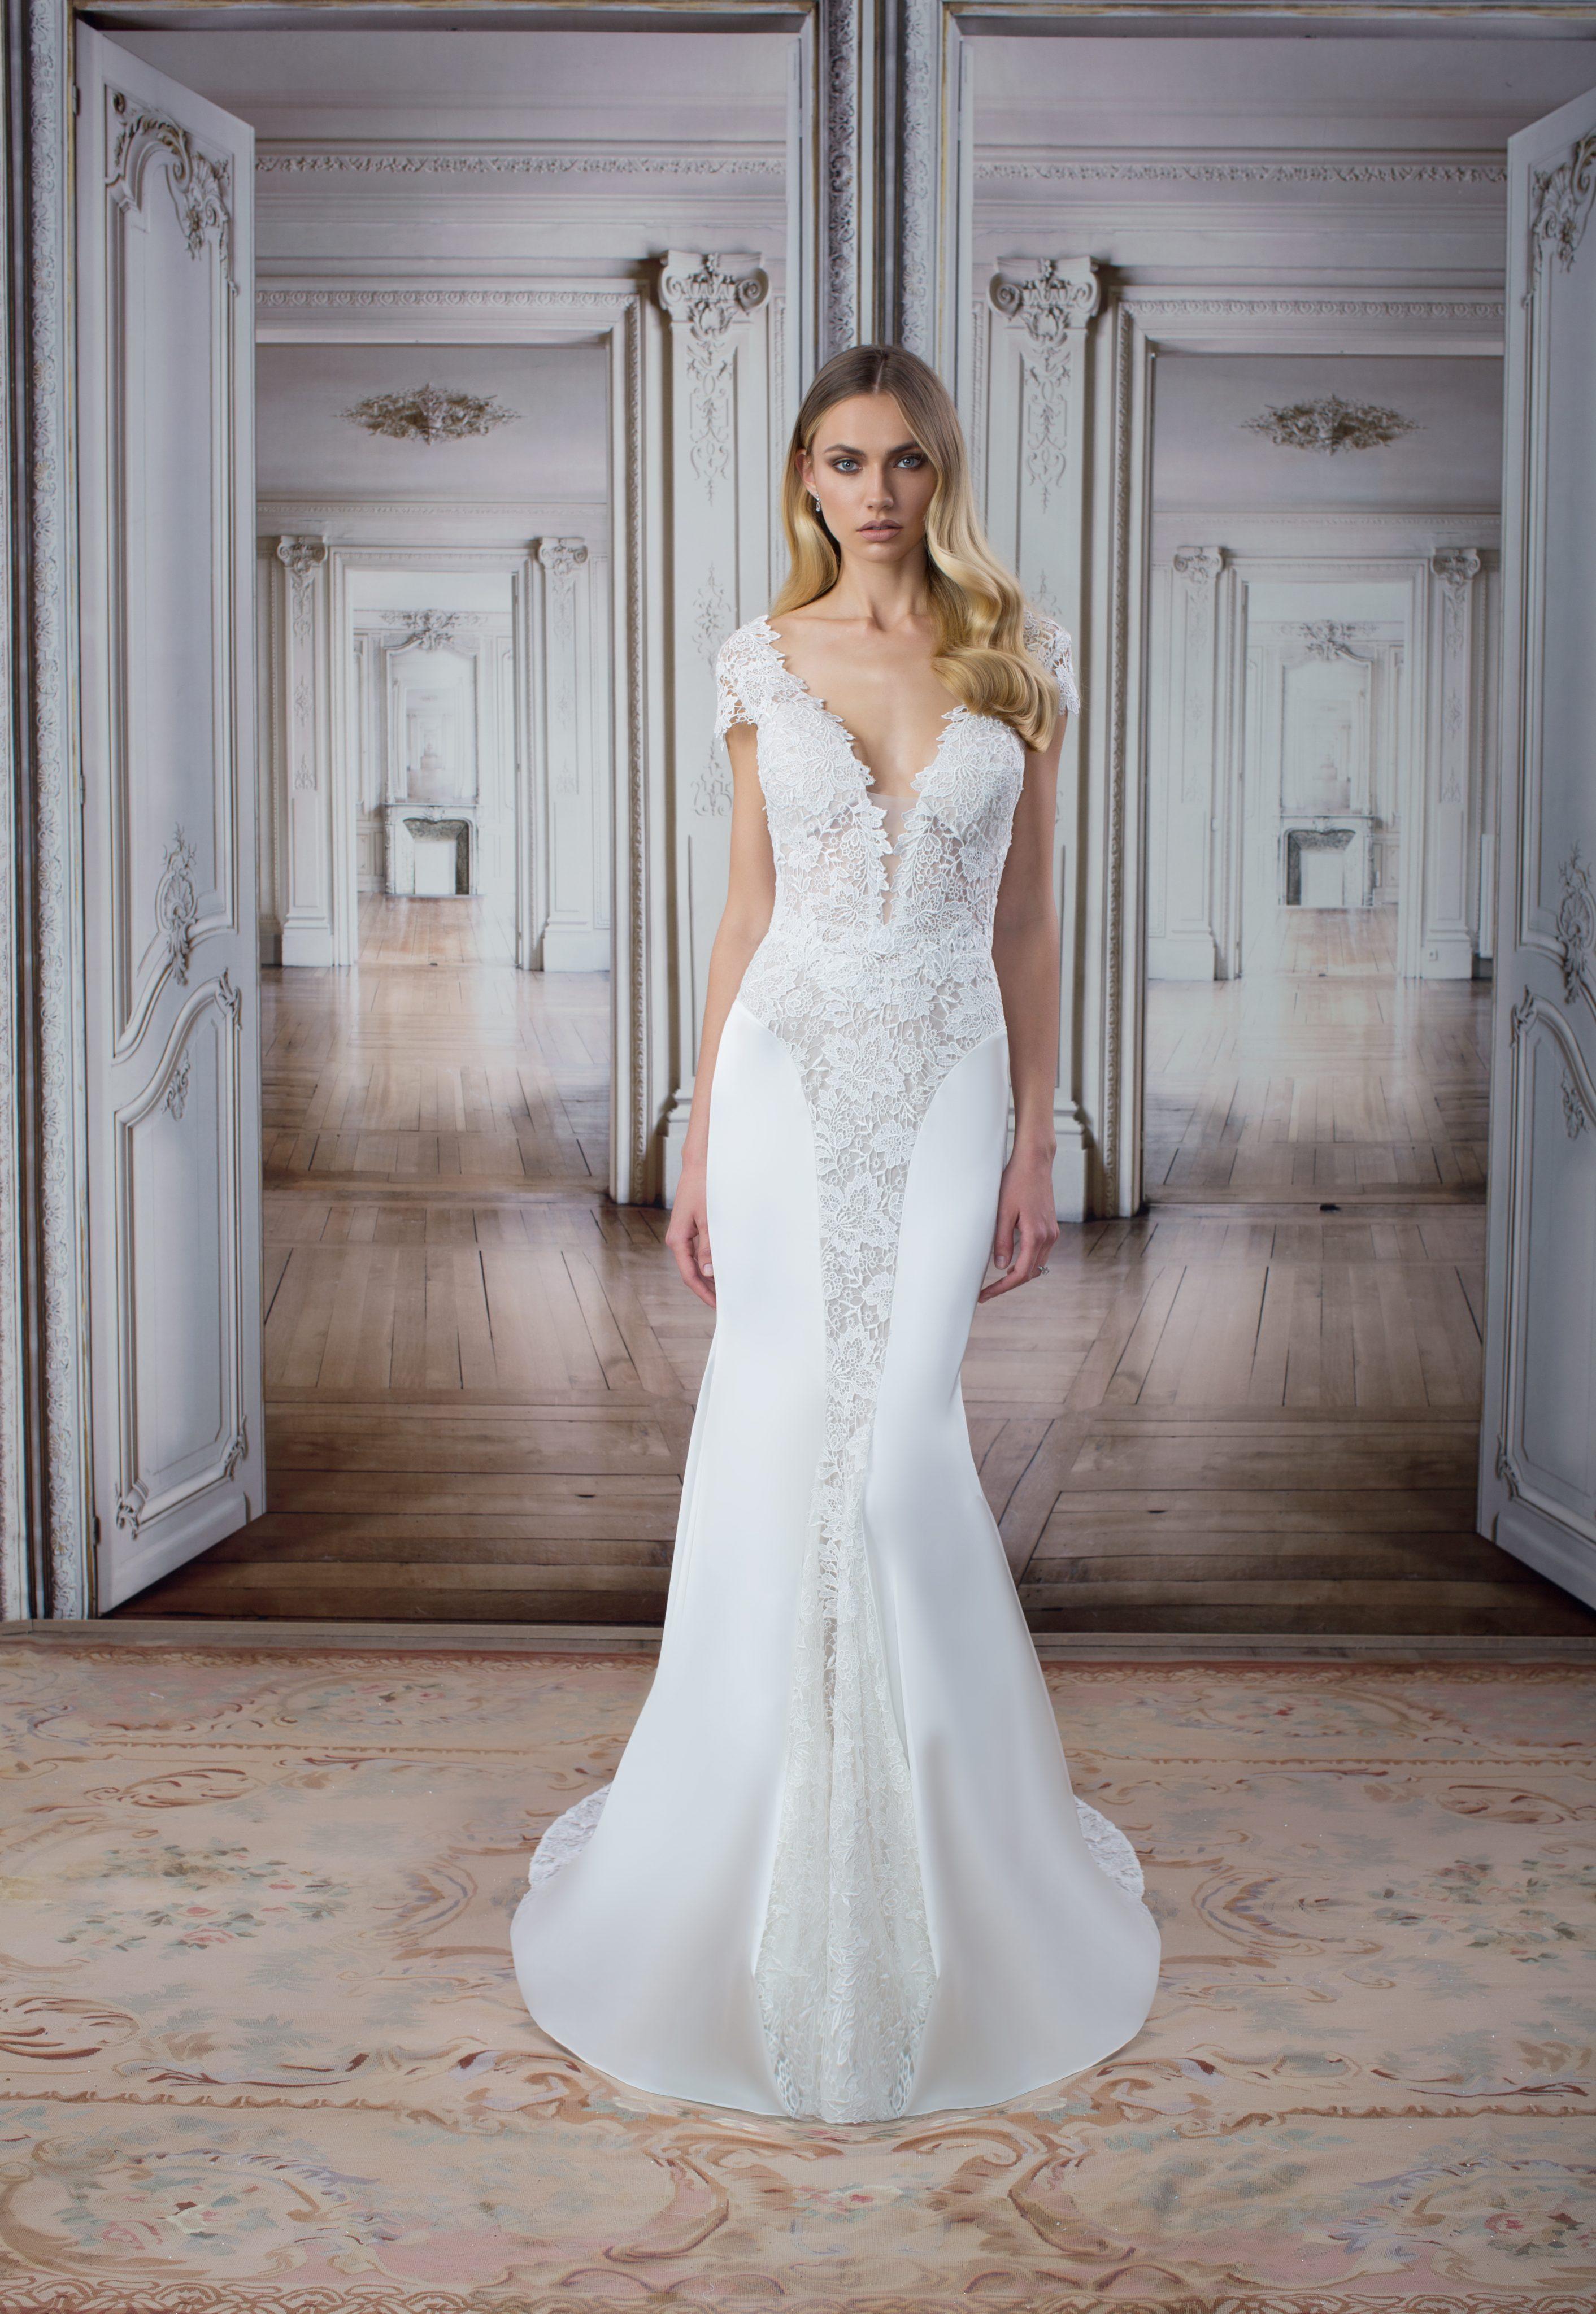 uks leading bridal designer - HD2825×4096